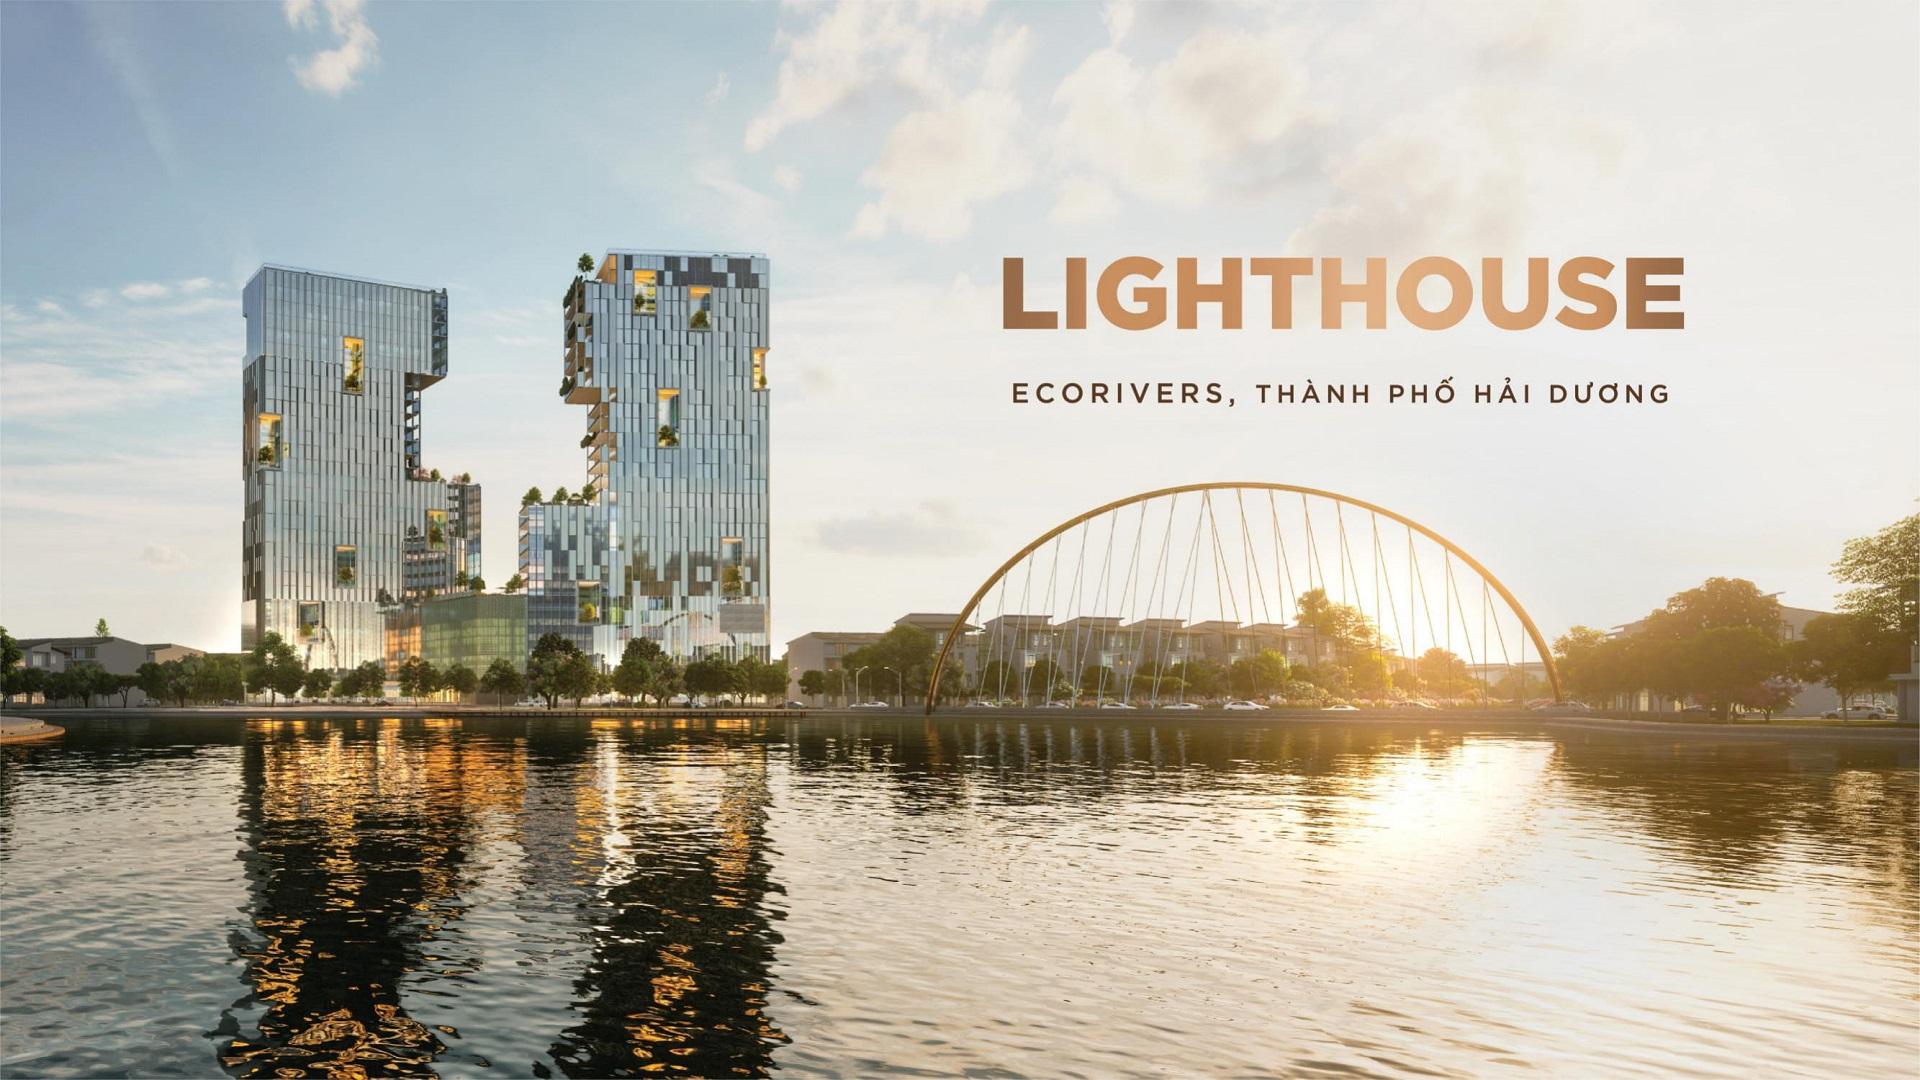 dự án lighthouse ecorivers hải dương